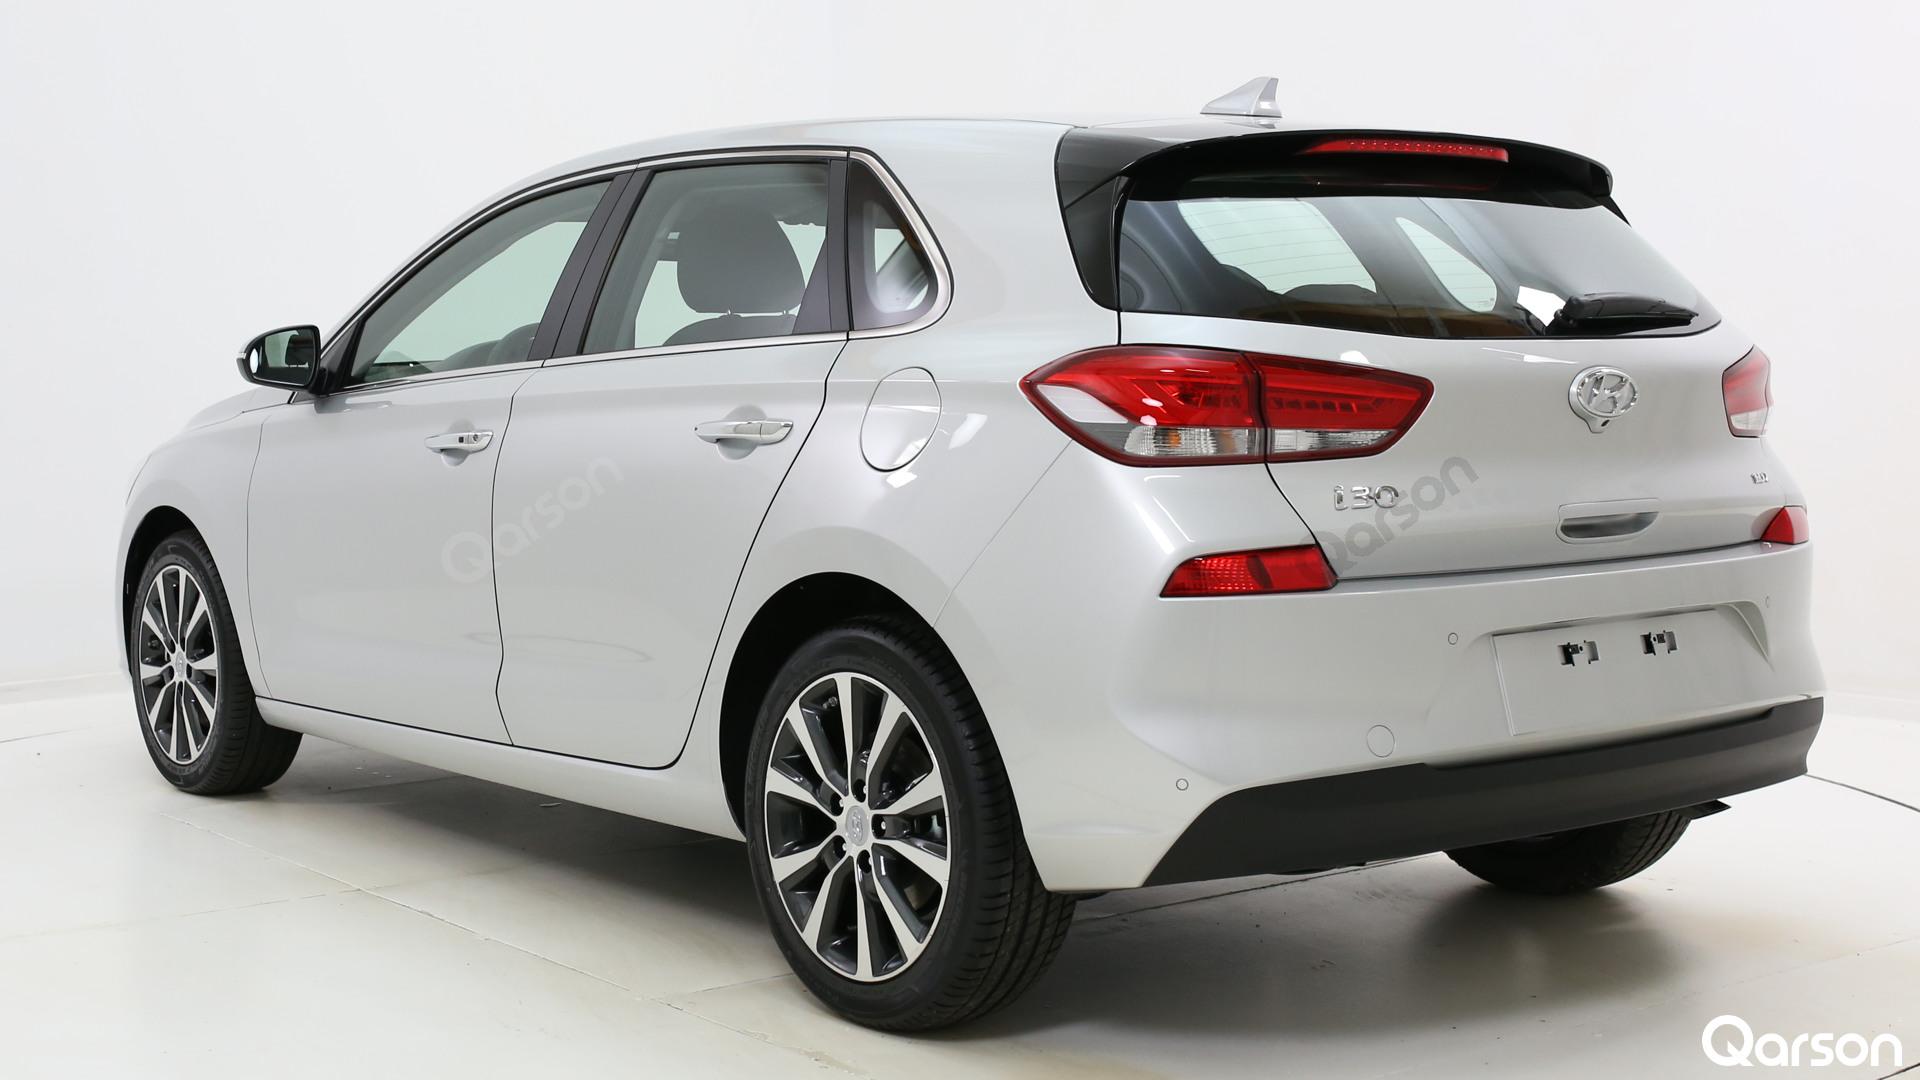 Hyundai I30 Iii 5d Benzyna Na Abonament W Ofercie Qarsona